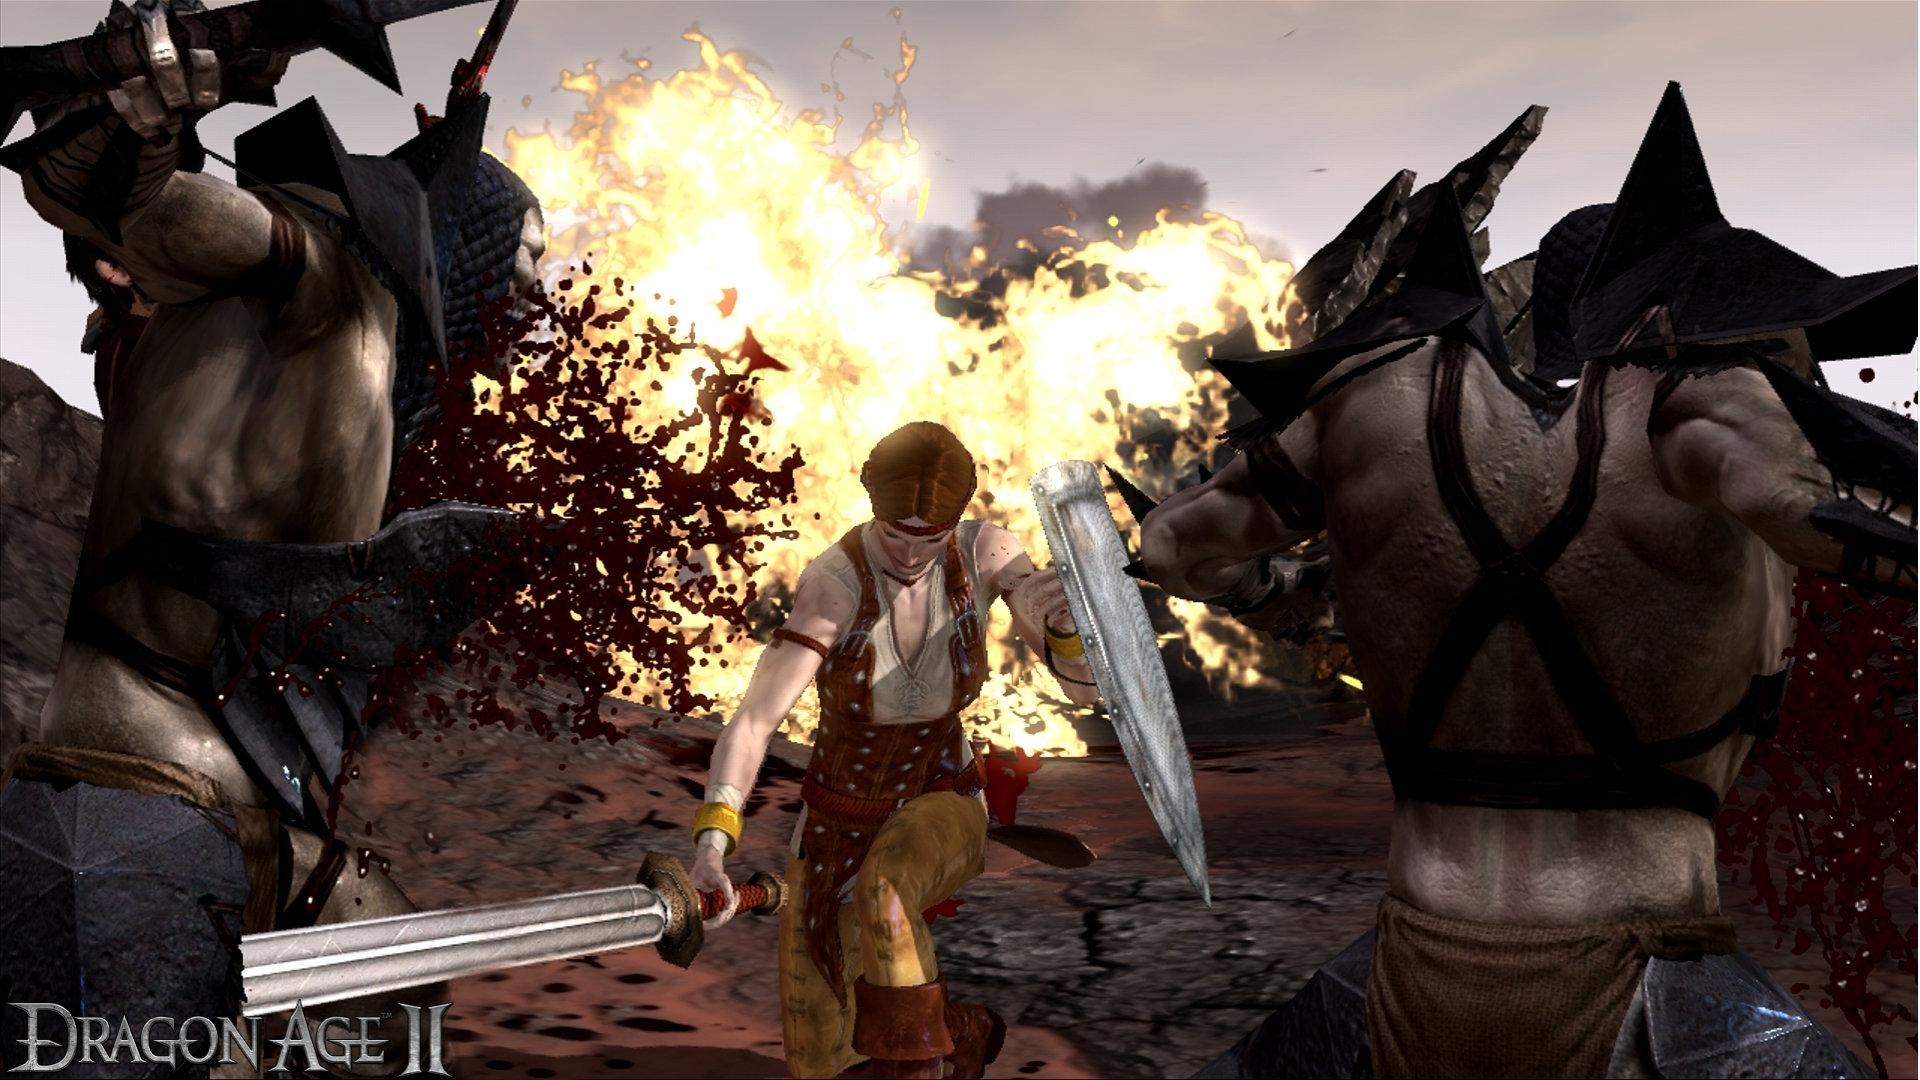 Dragon Age II - Preview